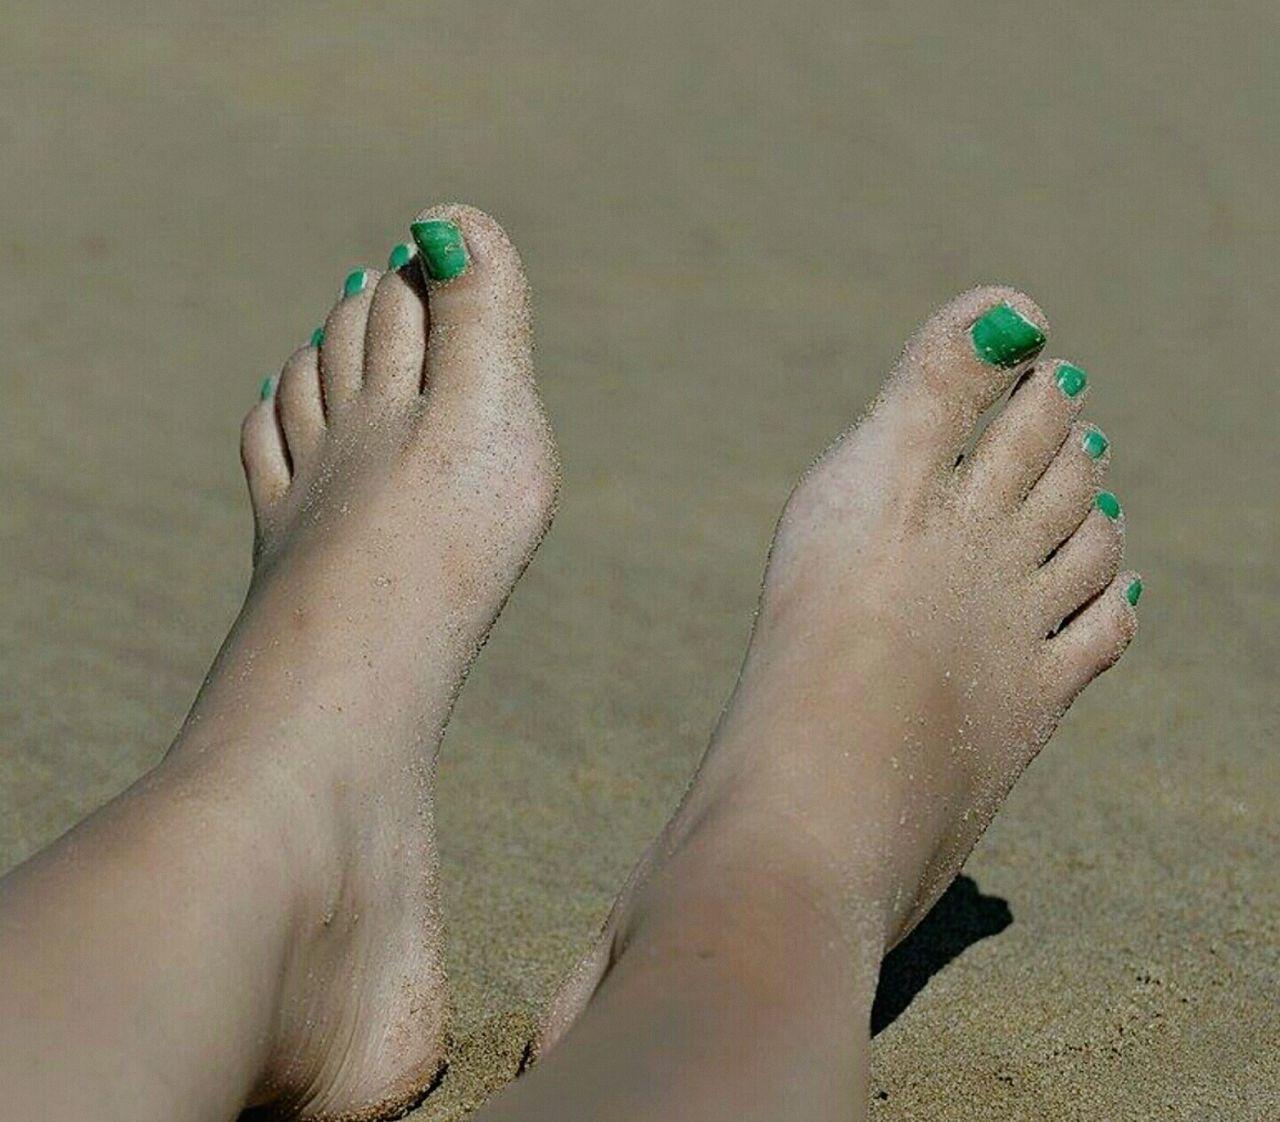 Onthebeach Summertime Summertan Taking Photos Hanging Out Relaxing Enjoying Life Nikond610 Shoothemall Green